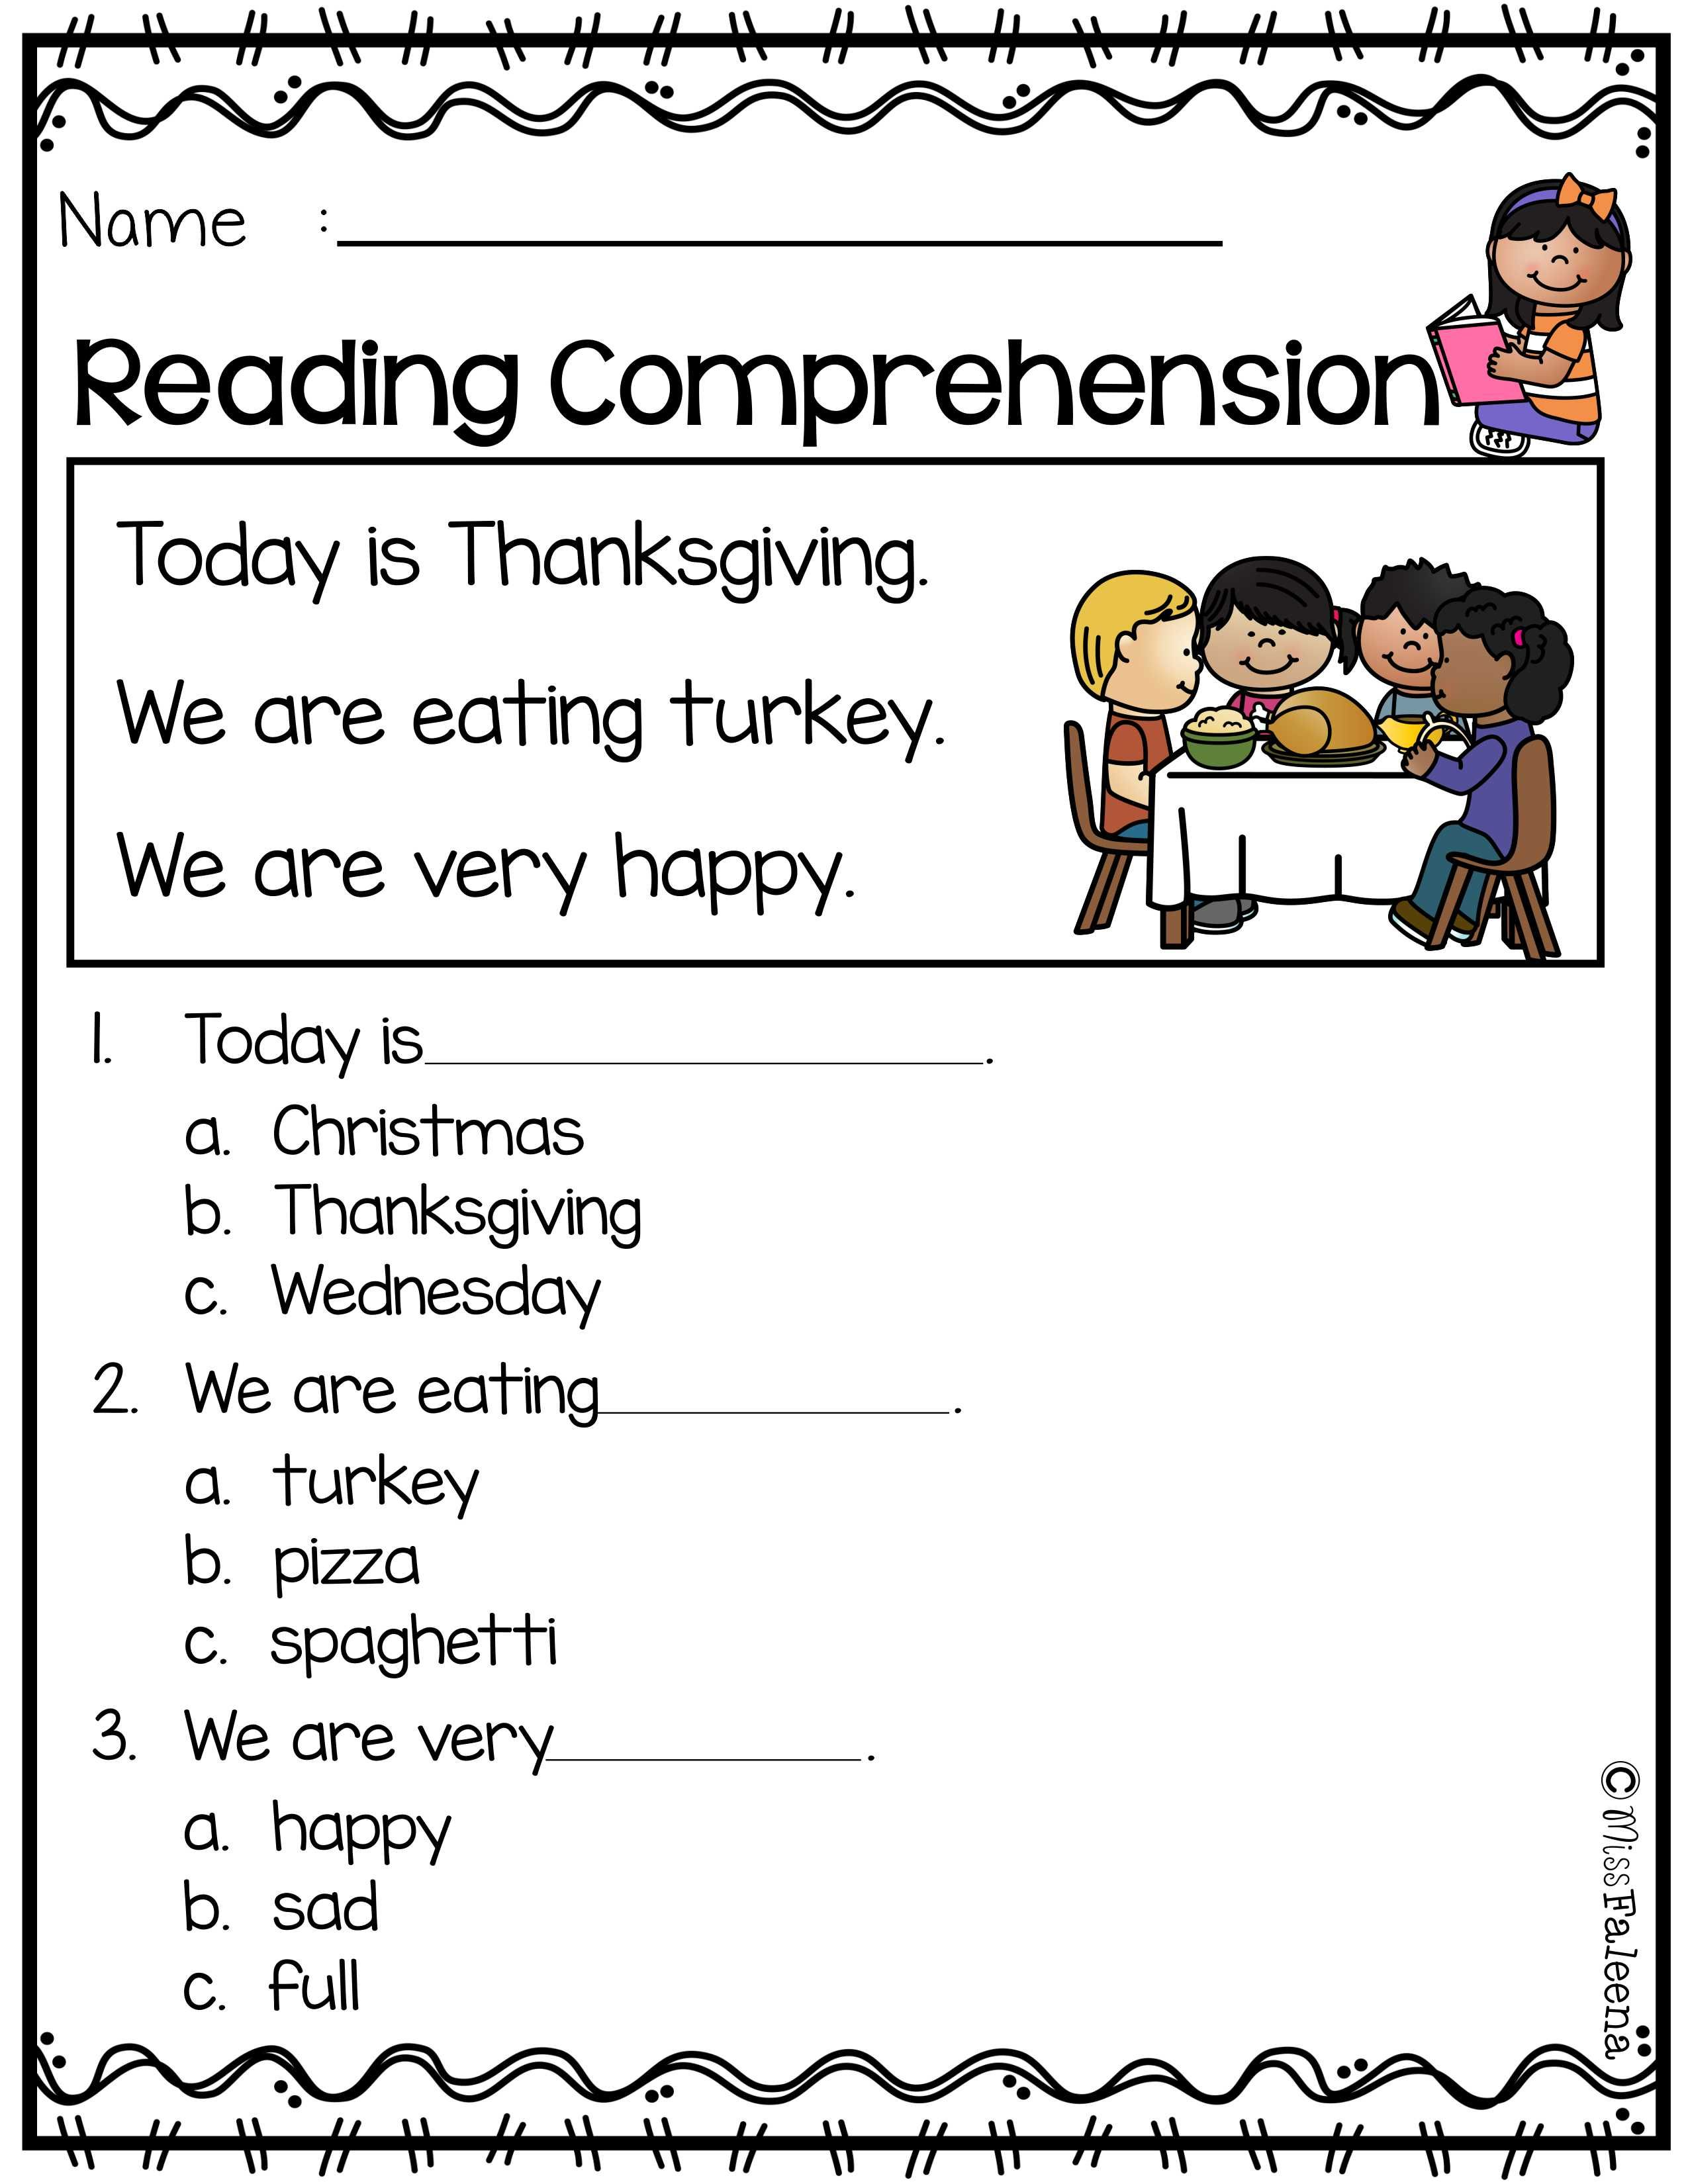 Pin On Miss Faleena S Store Kindergarten reading comprehension pdf